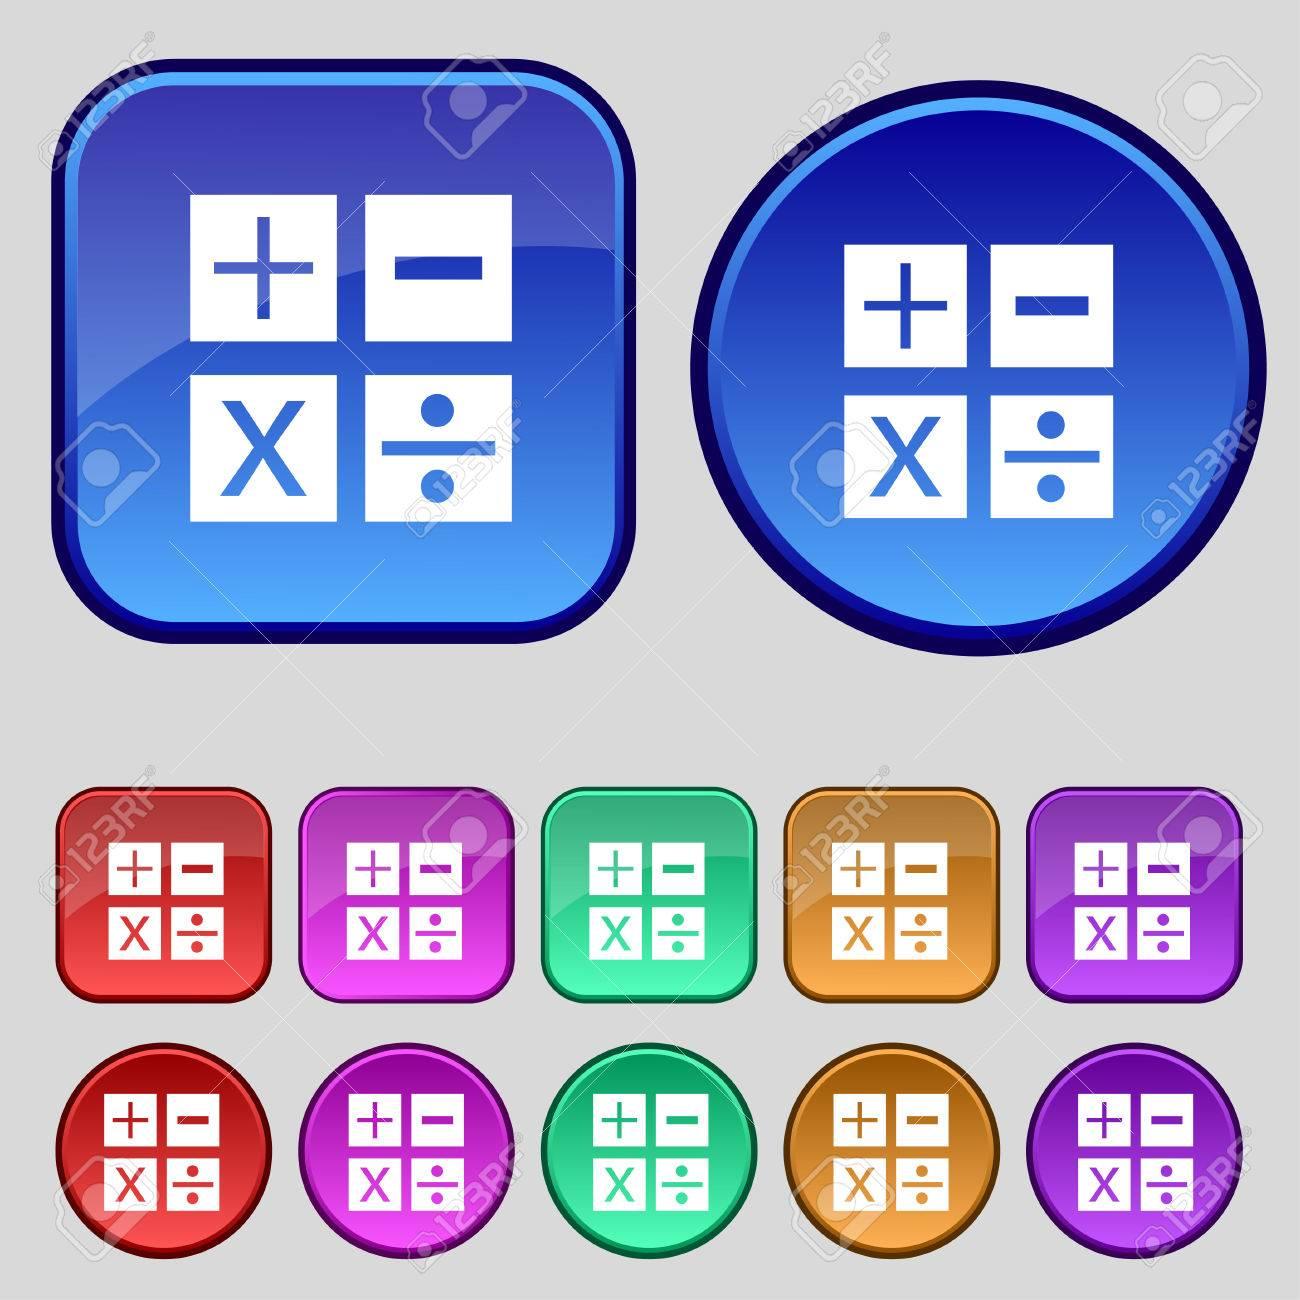 Multiplication division plus minus icon math symbol mathematics multiplication division plus minus icon math symbol mathematics set of colour buttons illustration biocorpaavc Image collections